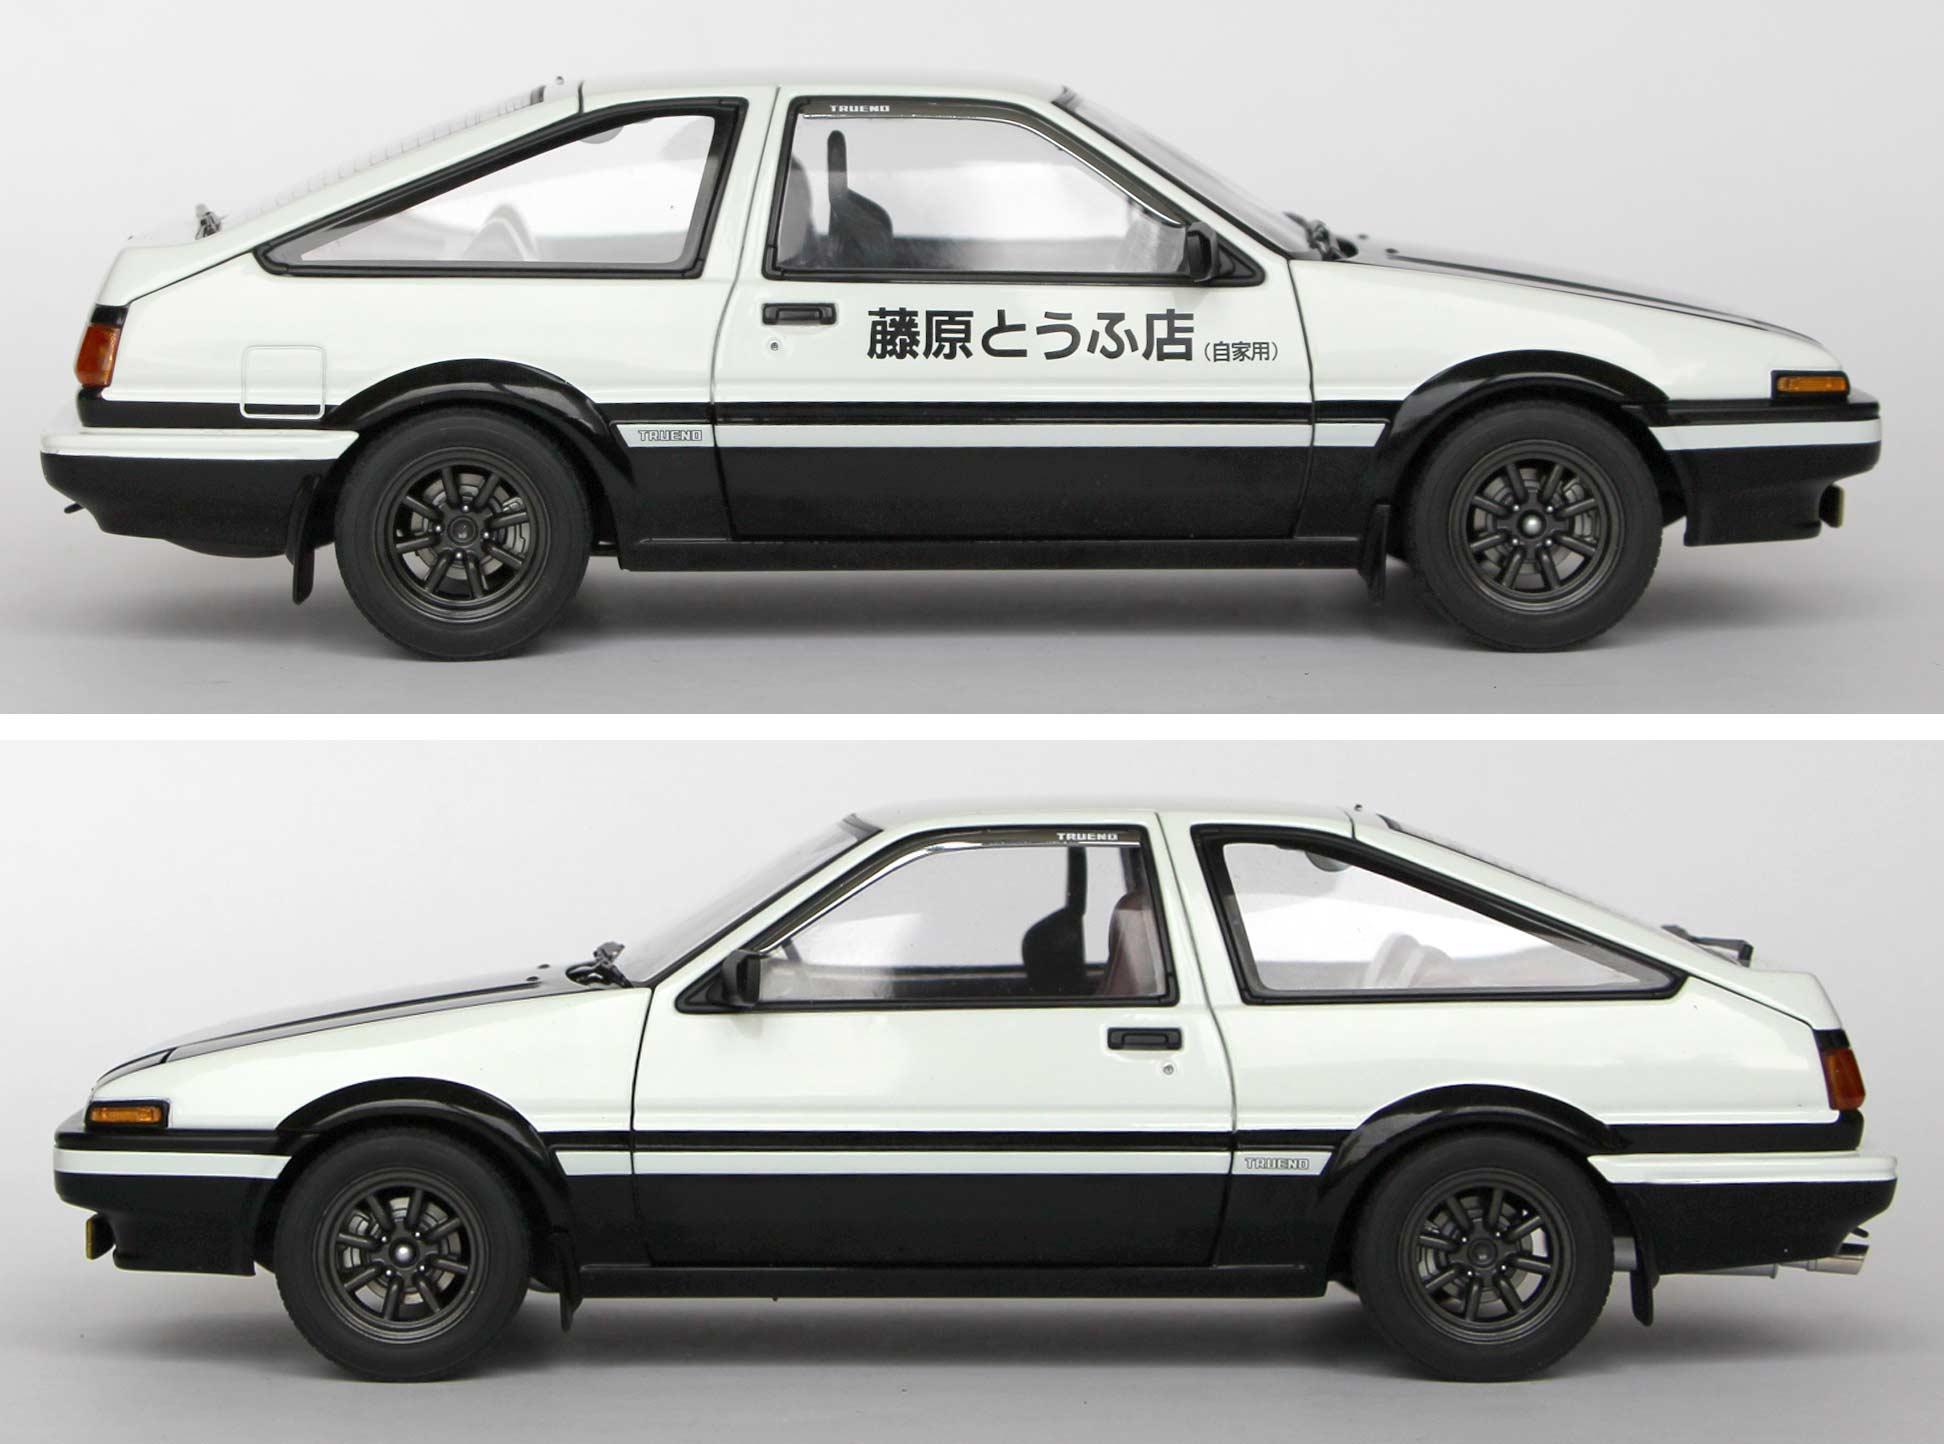 Toyota AE 86 - AUTOart - Initial D